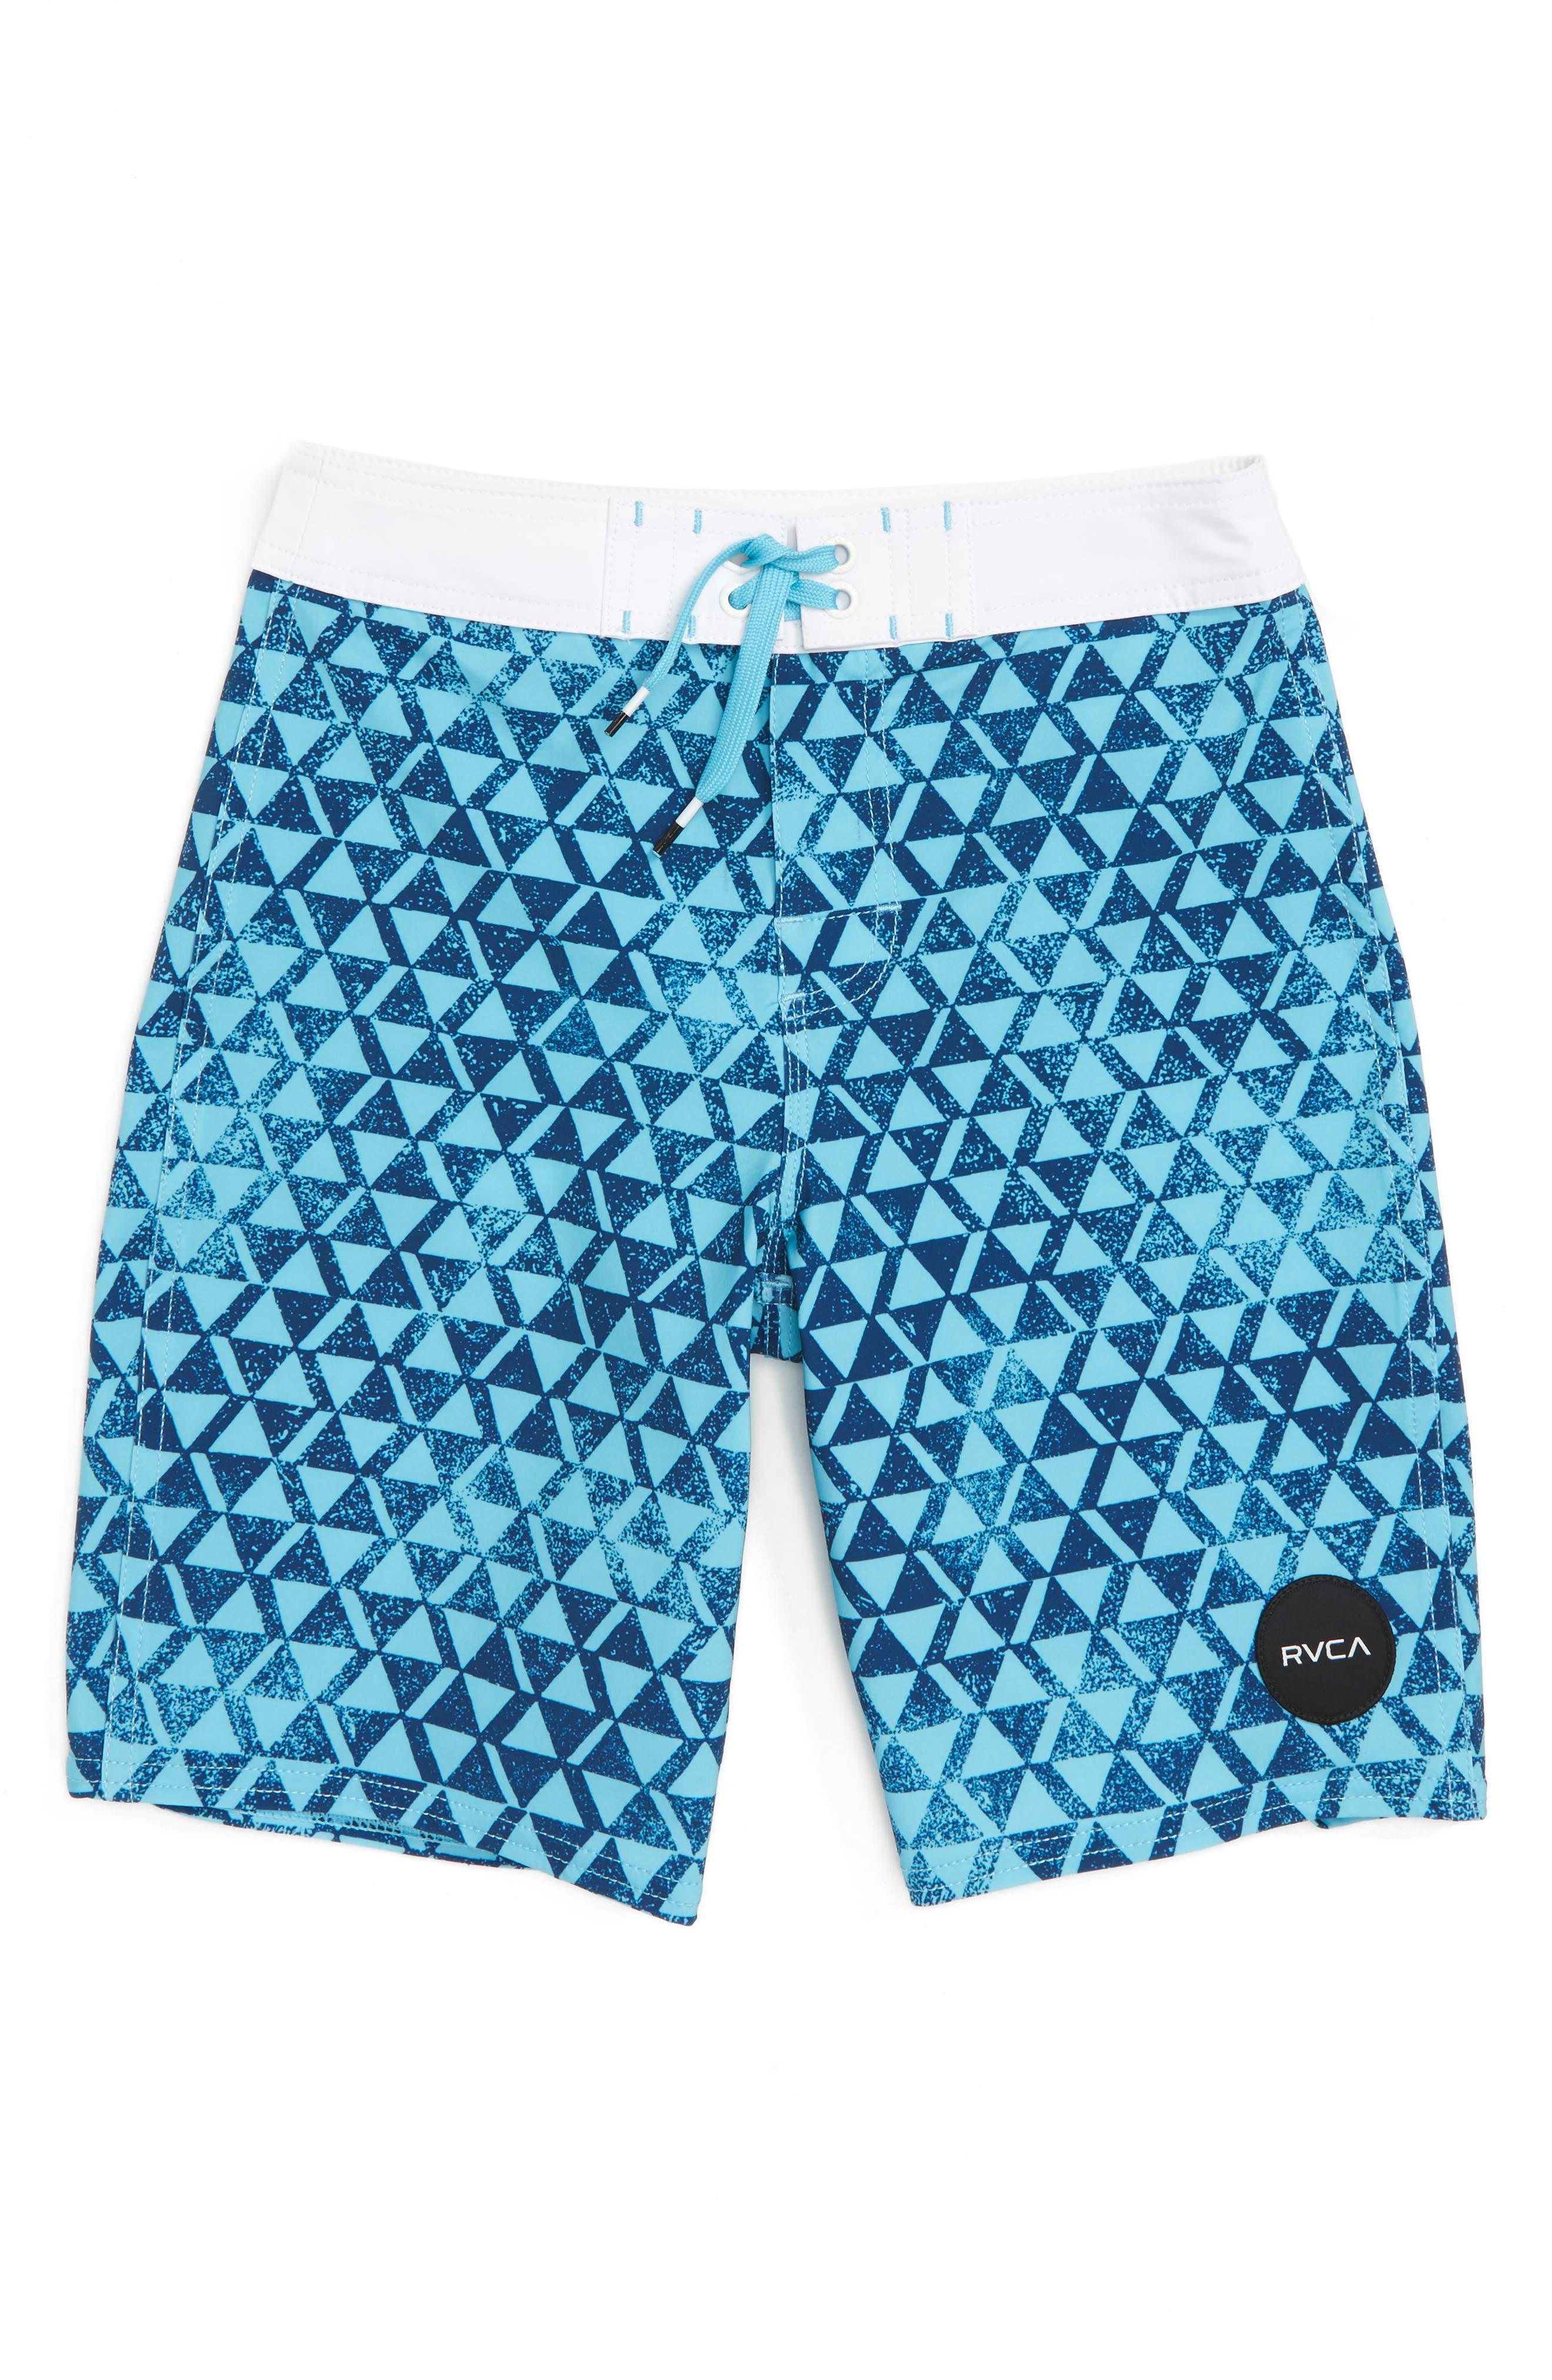 RVCA Vital Swim Trunks (Big Boys)